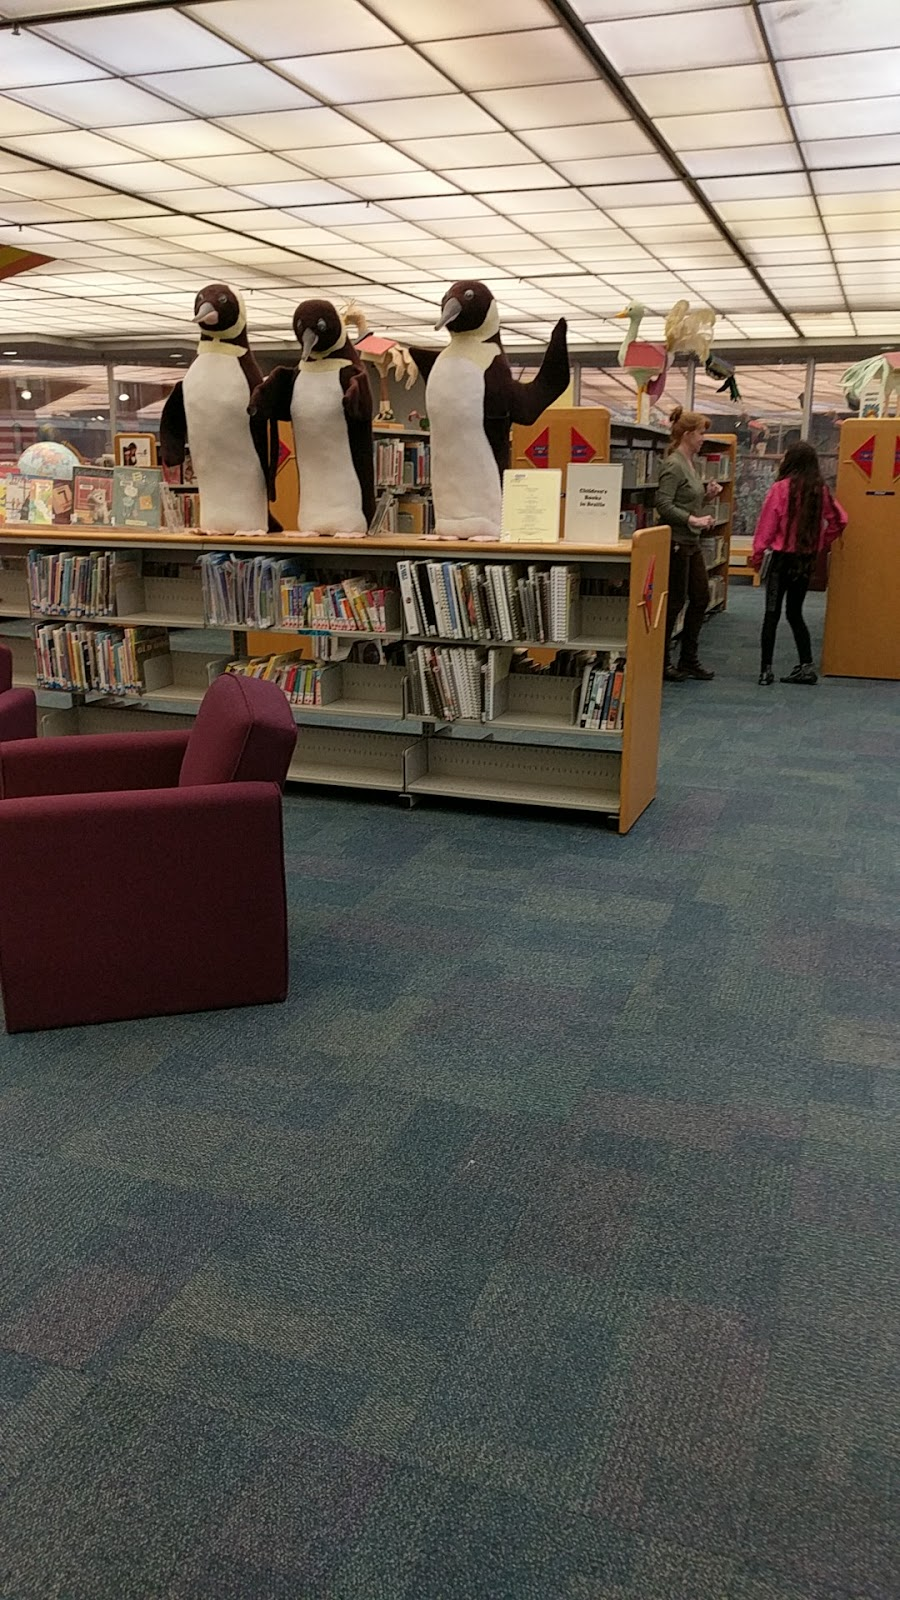 Alderney Gate Public Library | library | 60 Alderney Dr, Dartmouth, NS B2Y 4P8, Canada | 9024905753 OR +1 902-490-5753